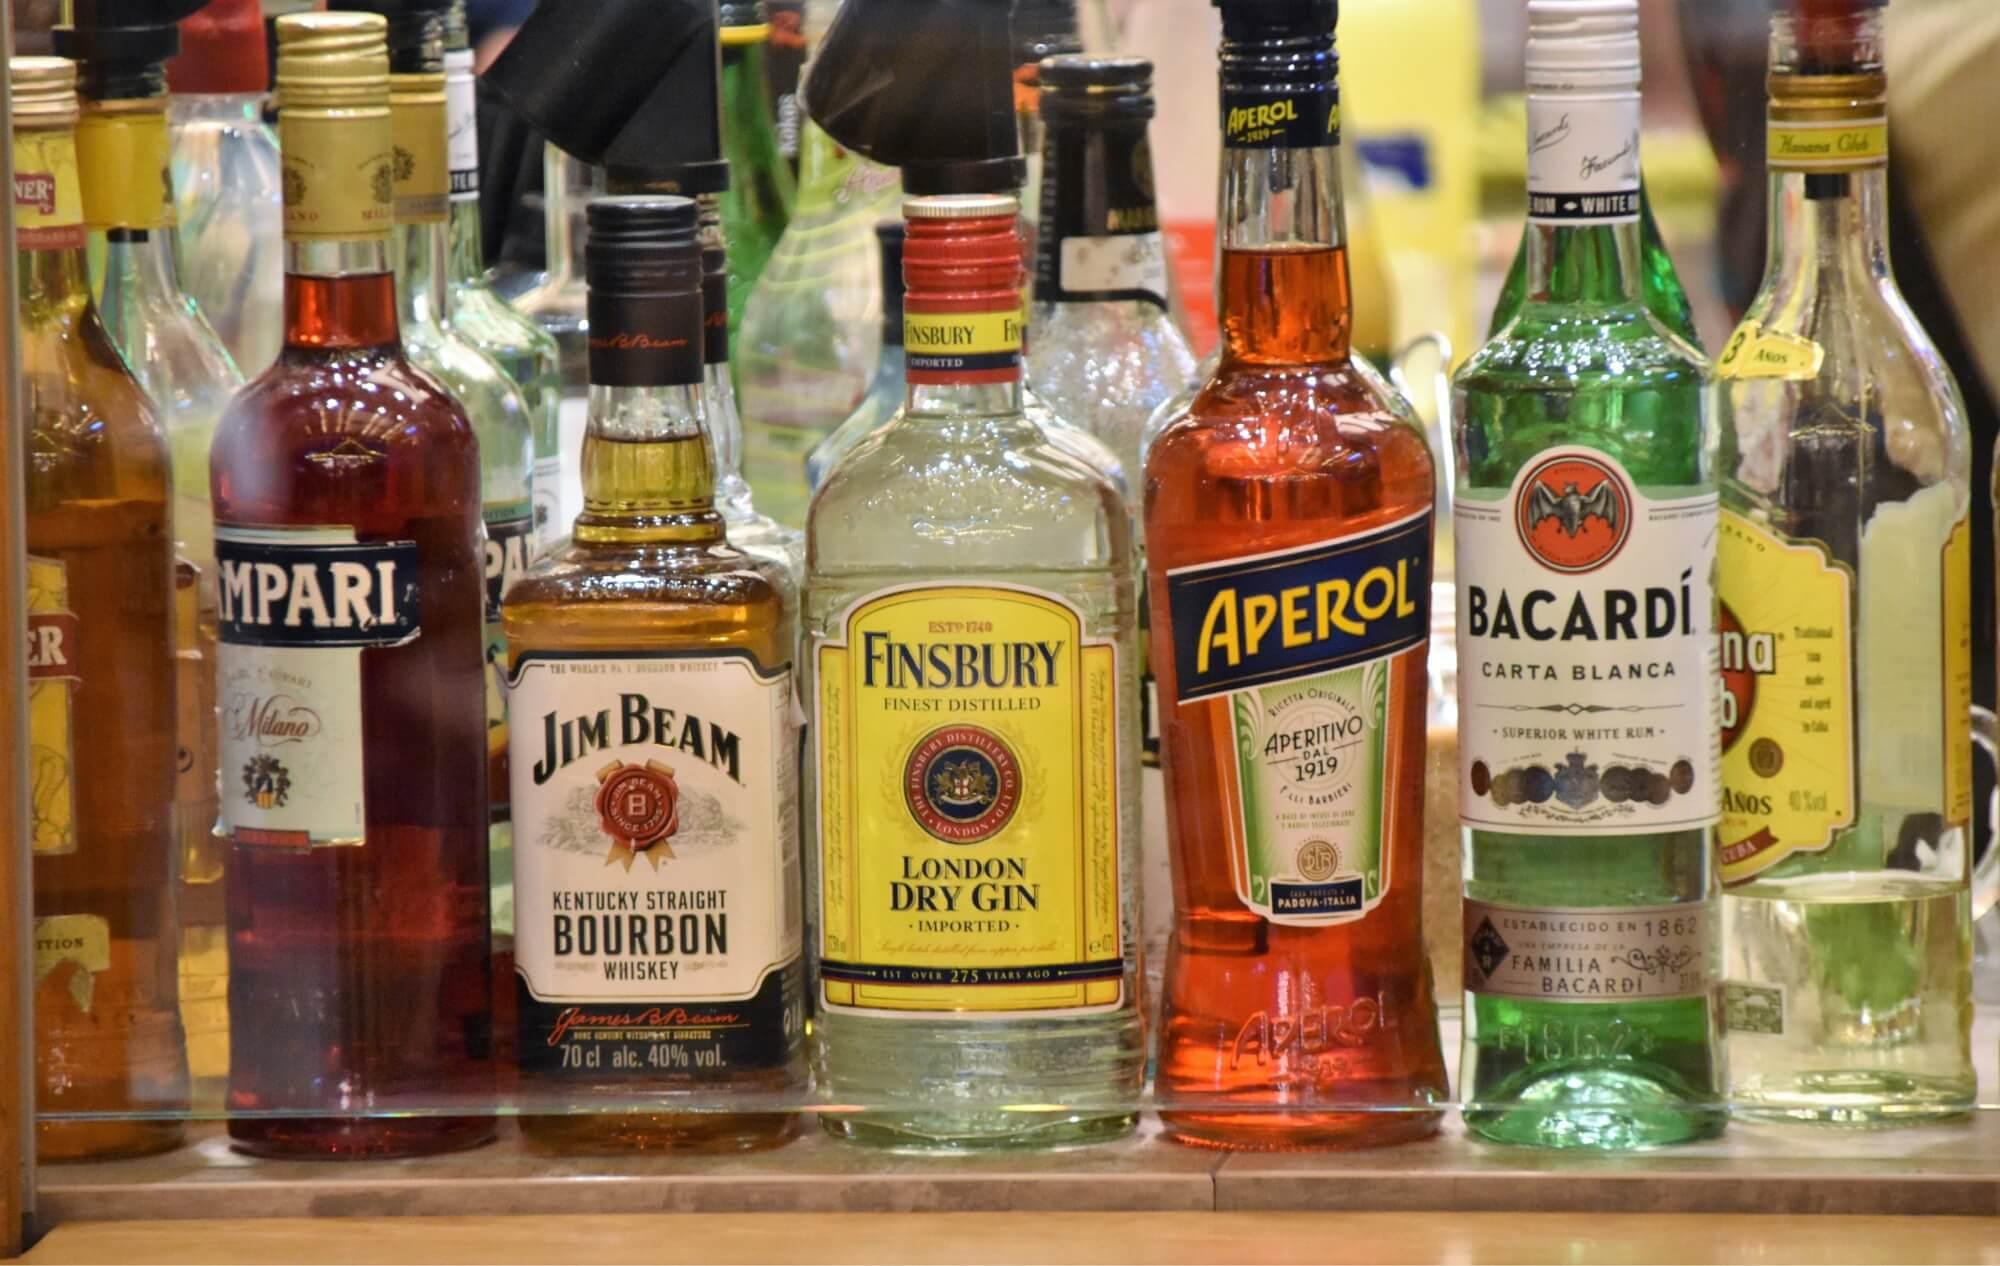 A photo of liquor bottles